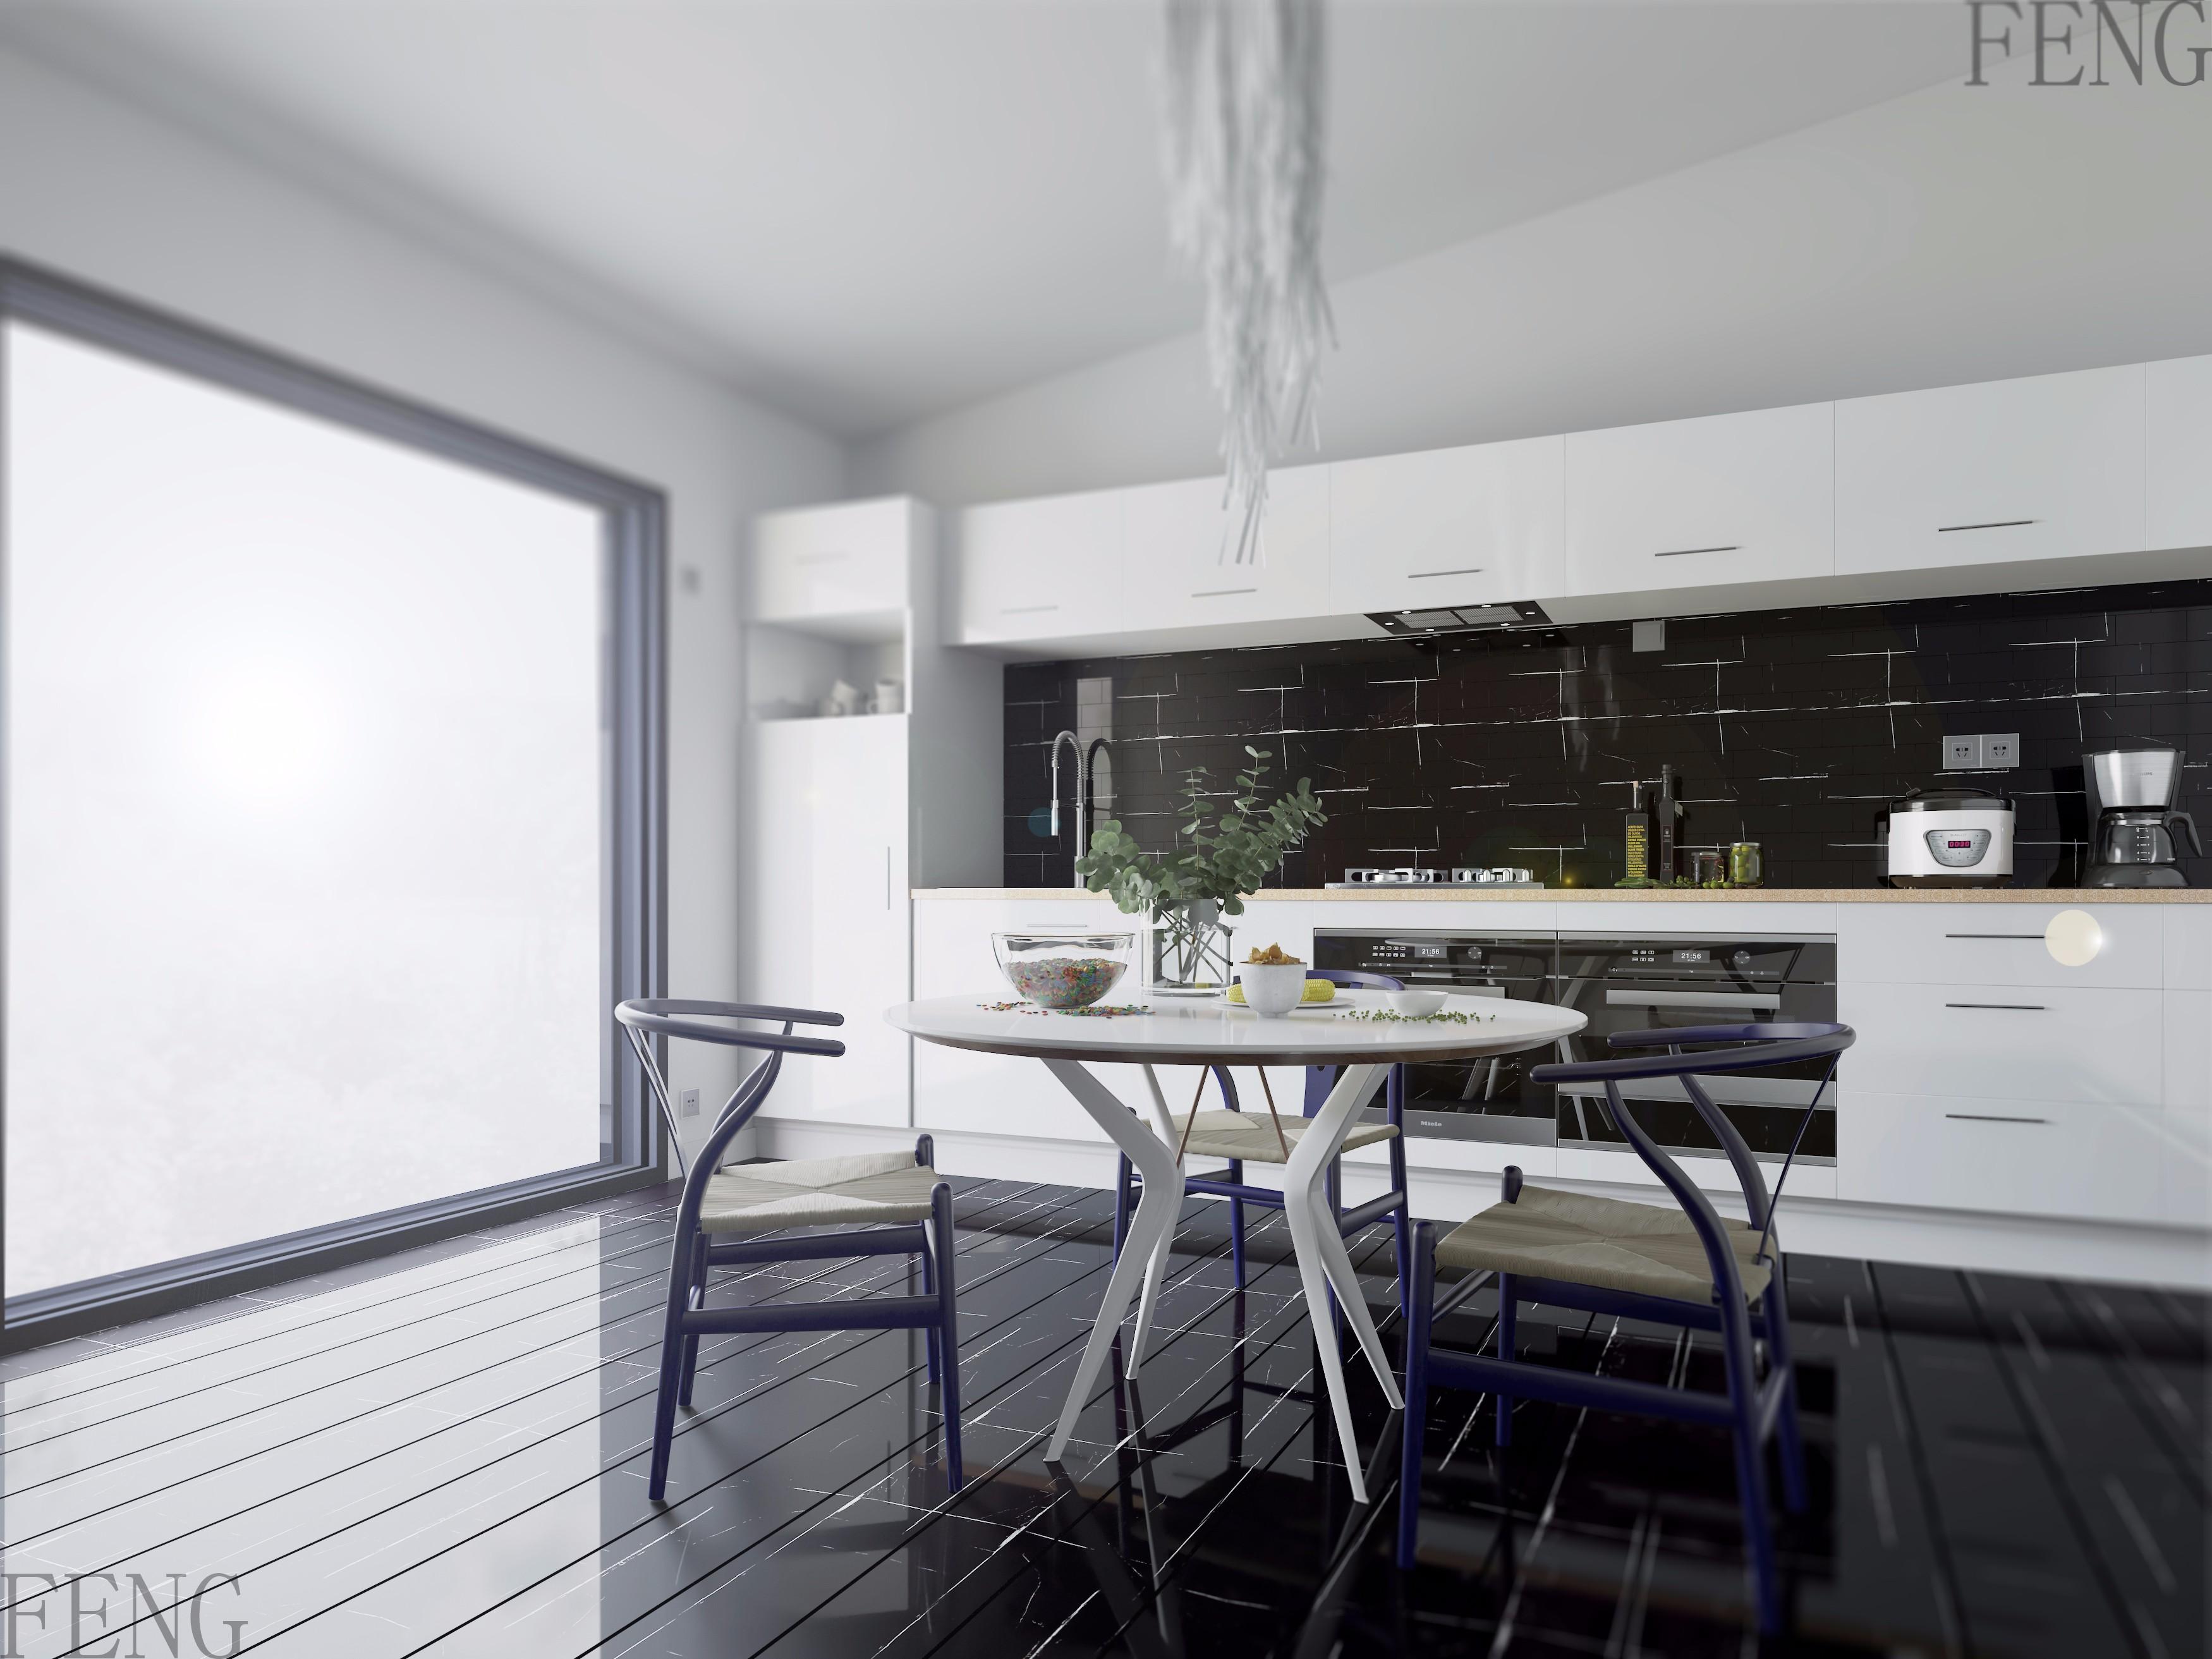 feng 小场景 - 效果图交流区-建e室内设计网